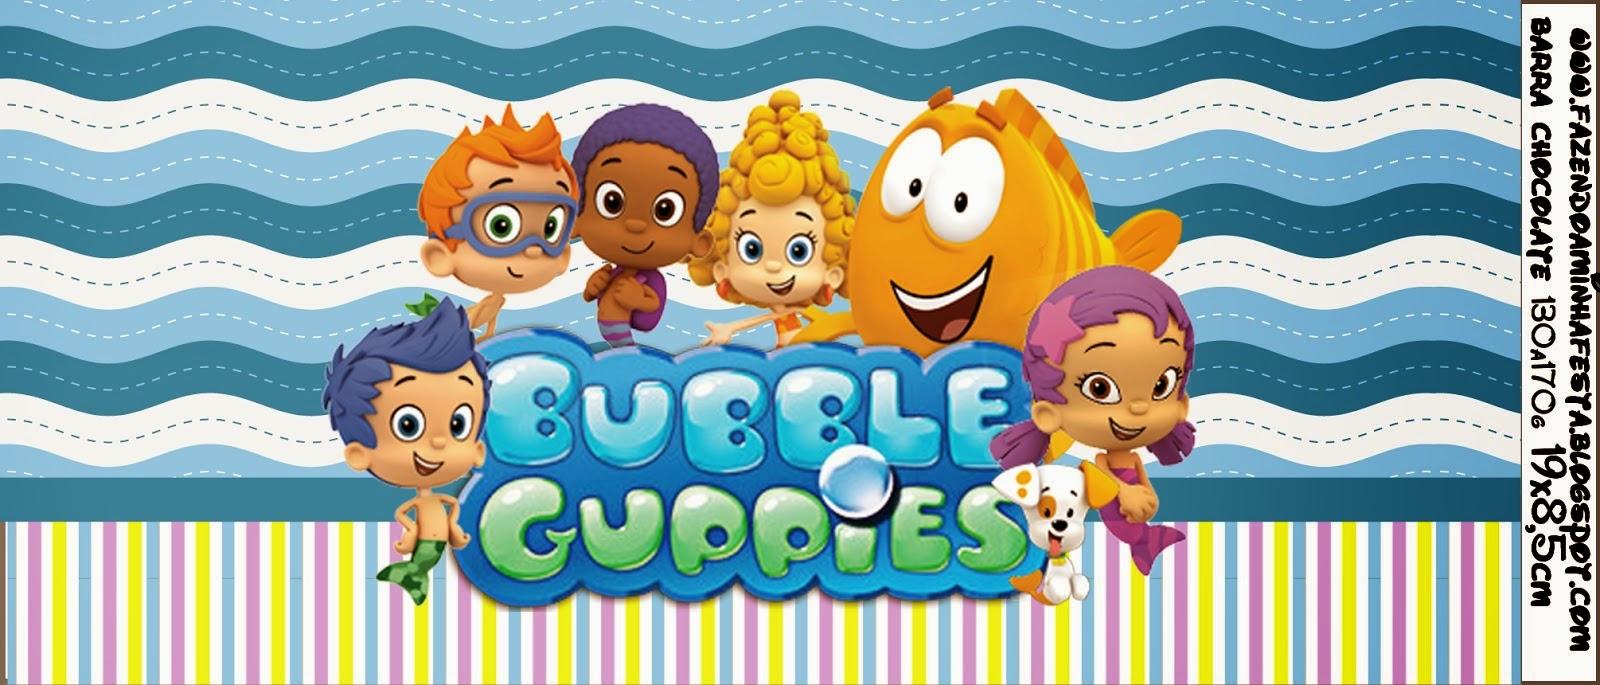 Bubble Guppies: Etiquetas para Candy Bar para Imprimir Gratis ...